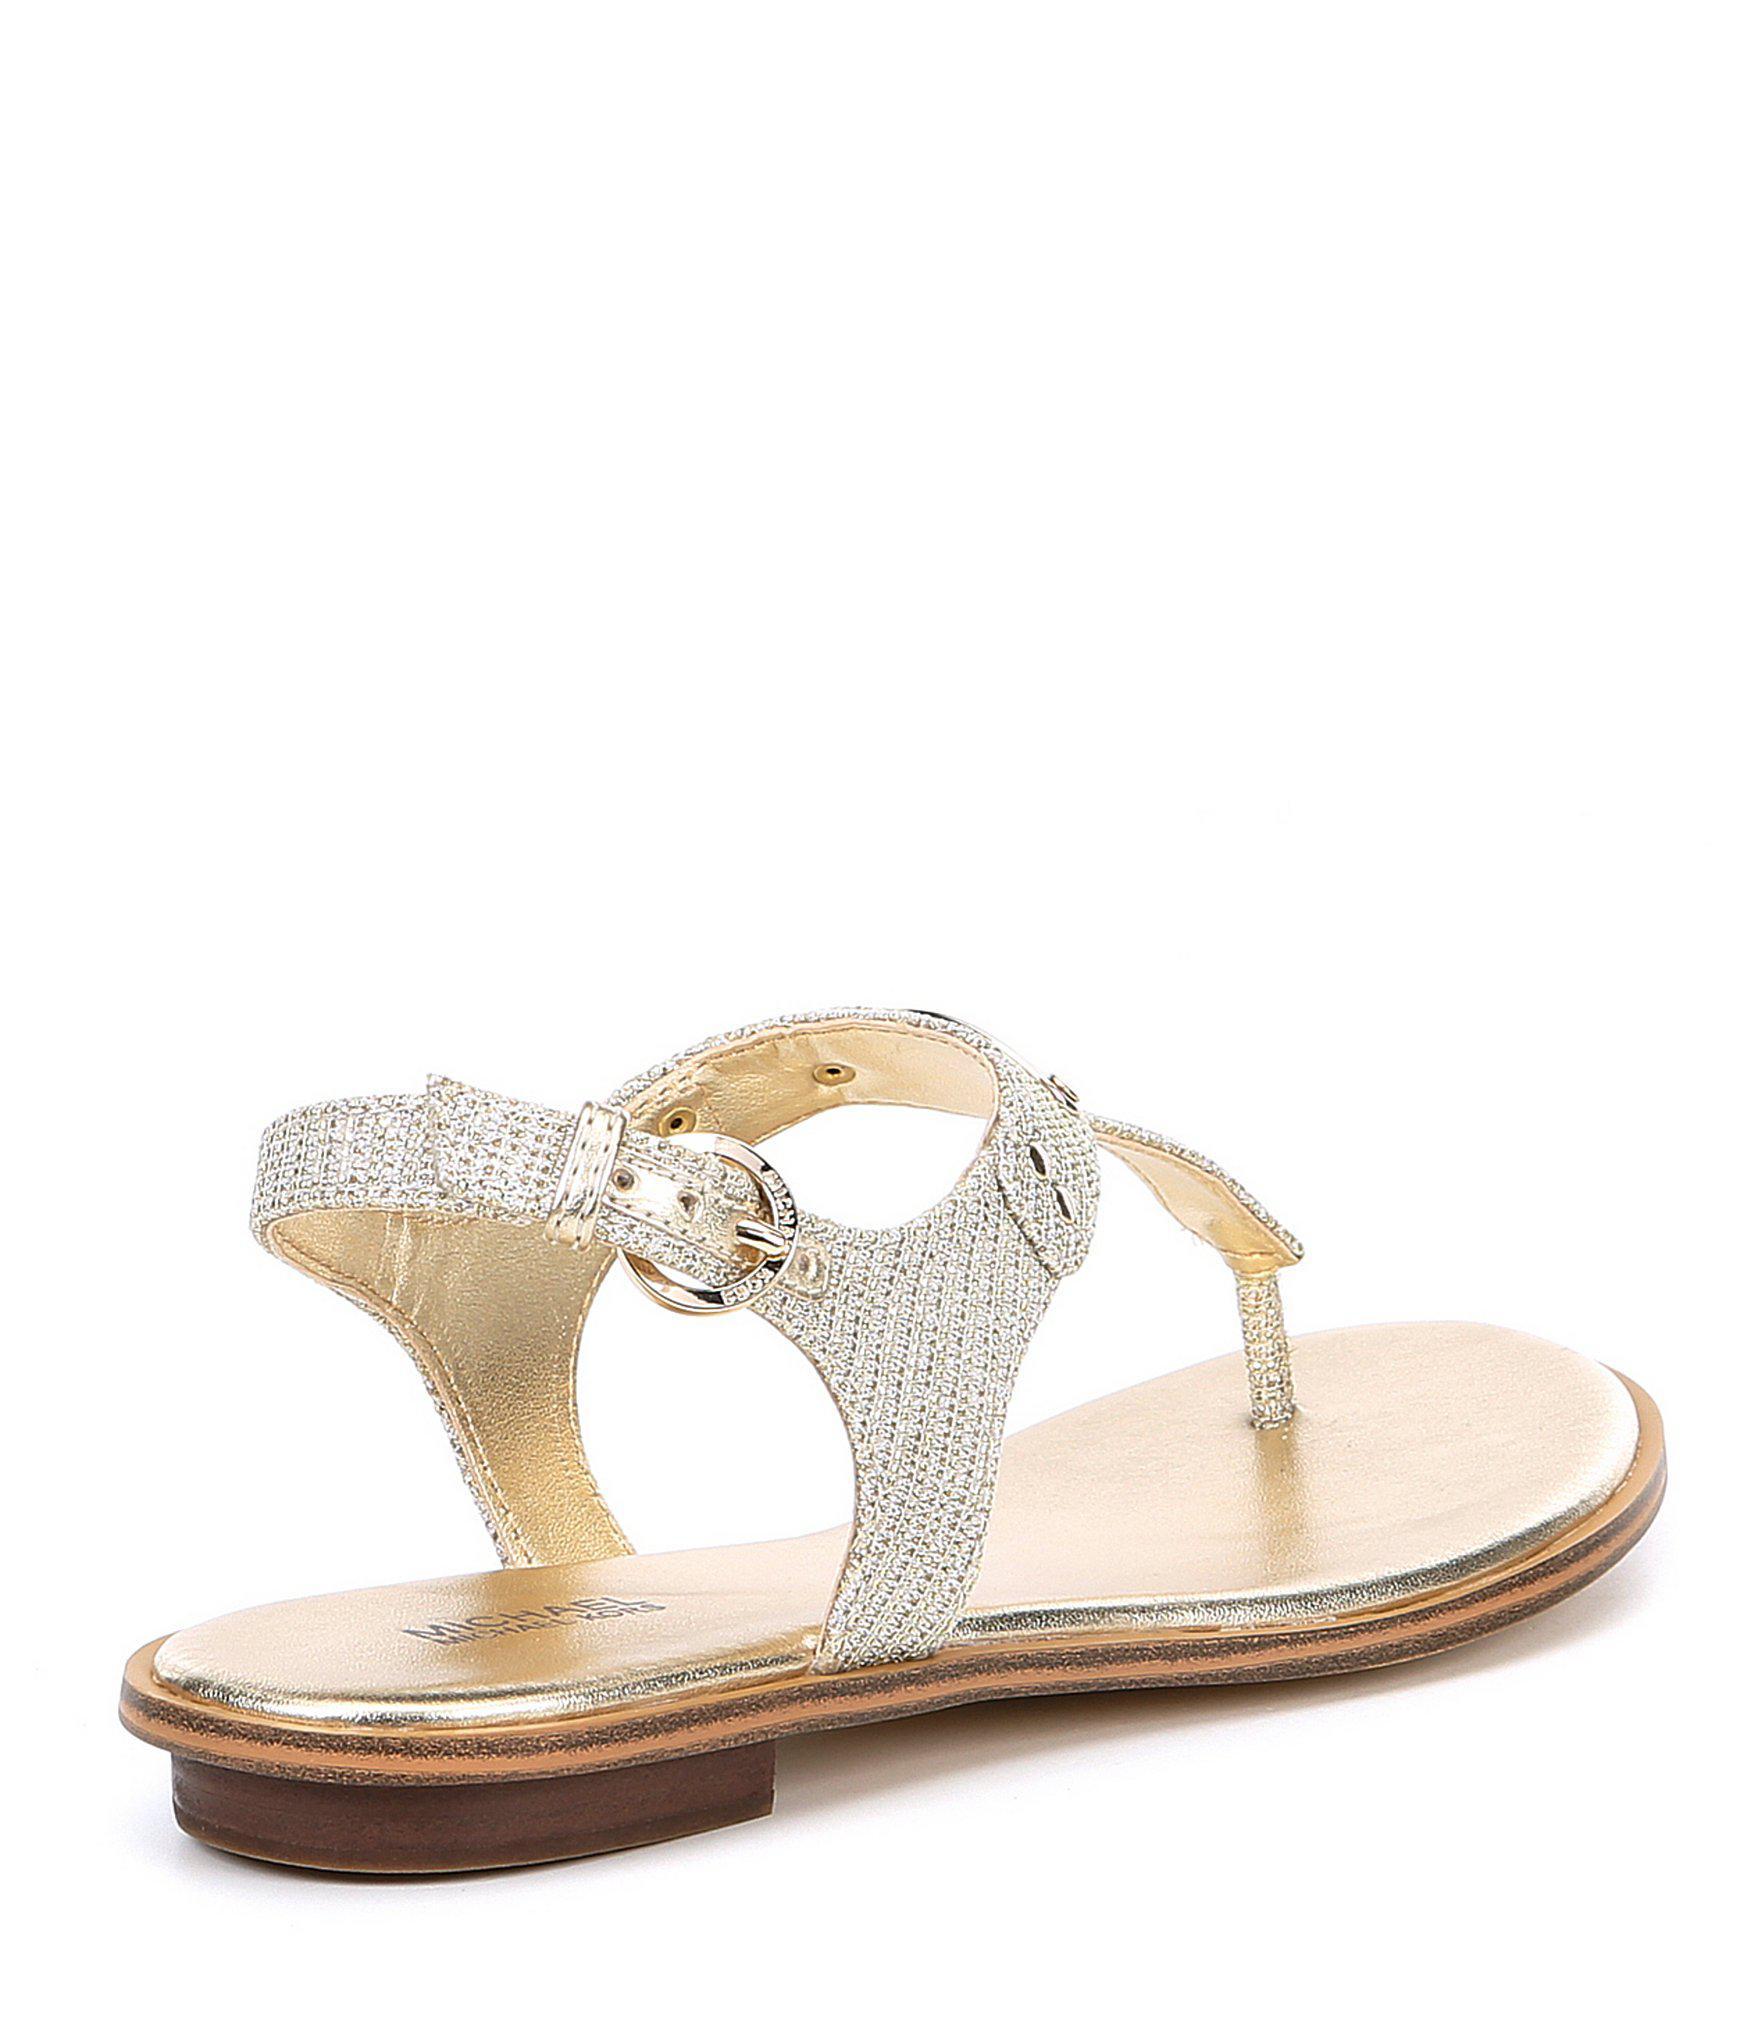 7b4b7291fb0828 MICHAEL Michael Kors - Metallic Mk Plate Glitter Thong Sandals - Lyst. View  fullscreen